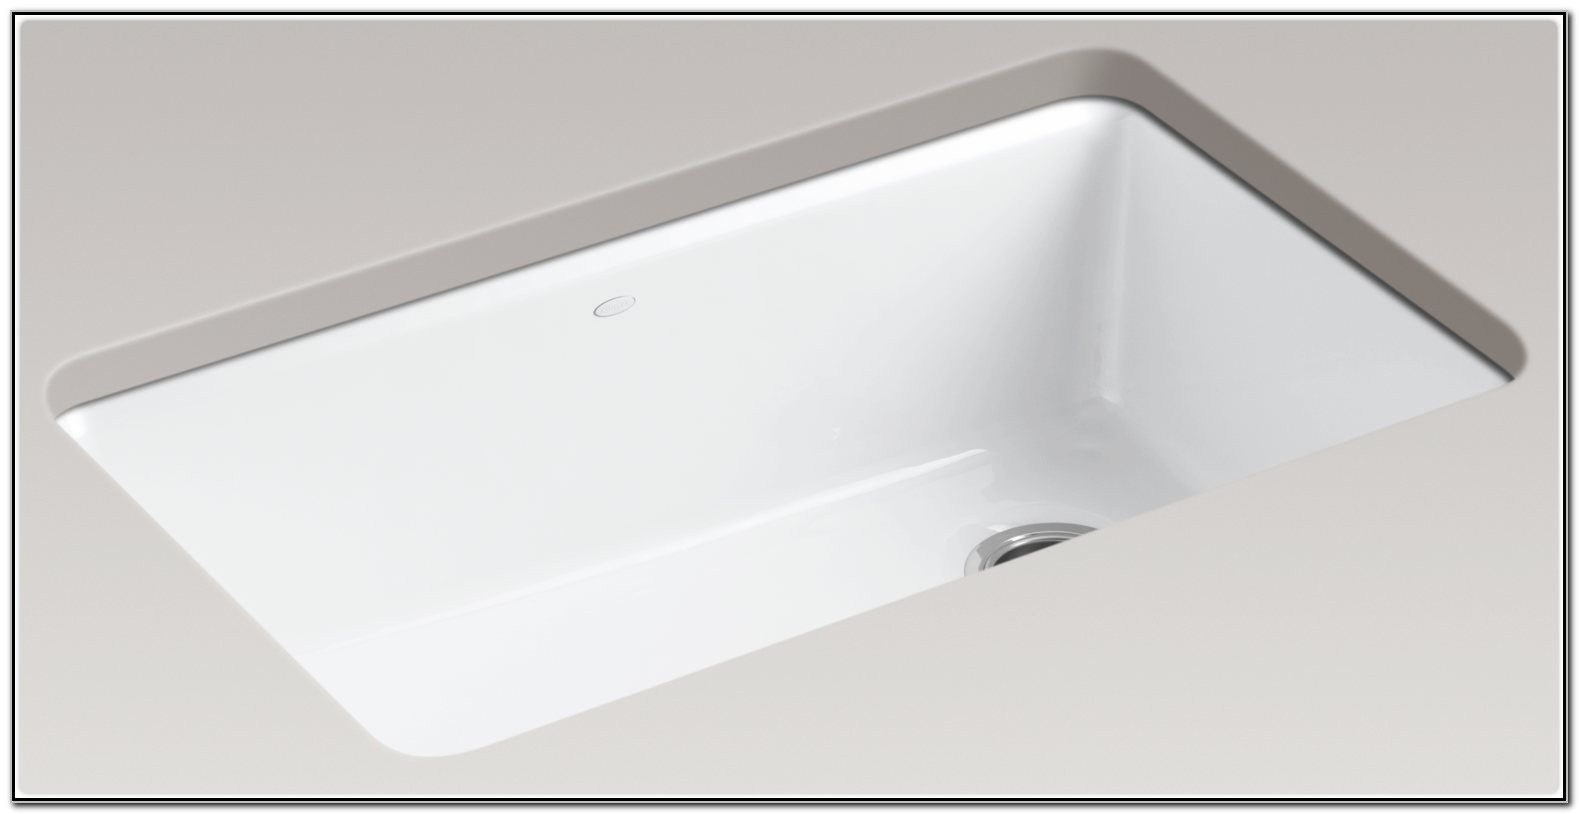 Kohler Single Bowl Undermount Kitchen Sink